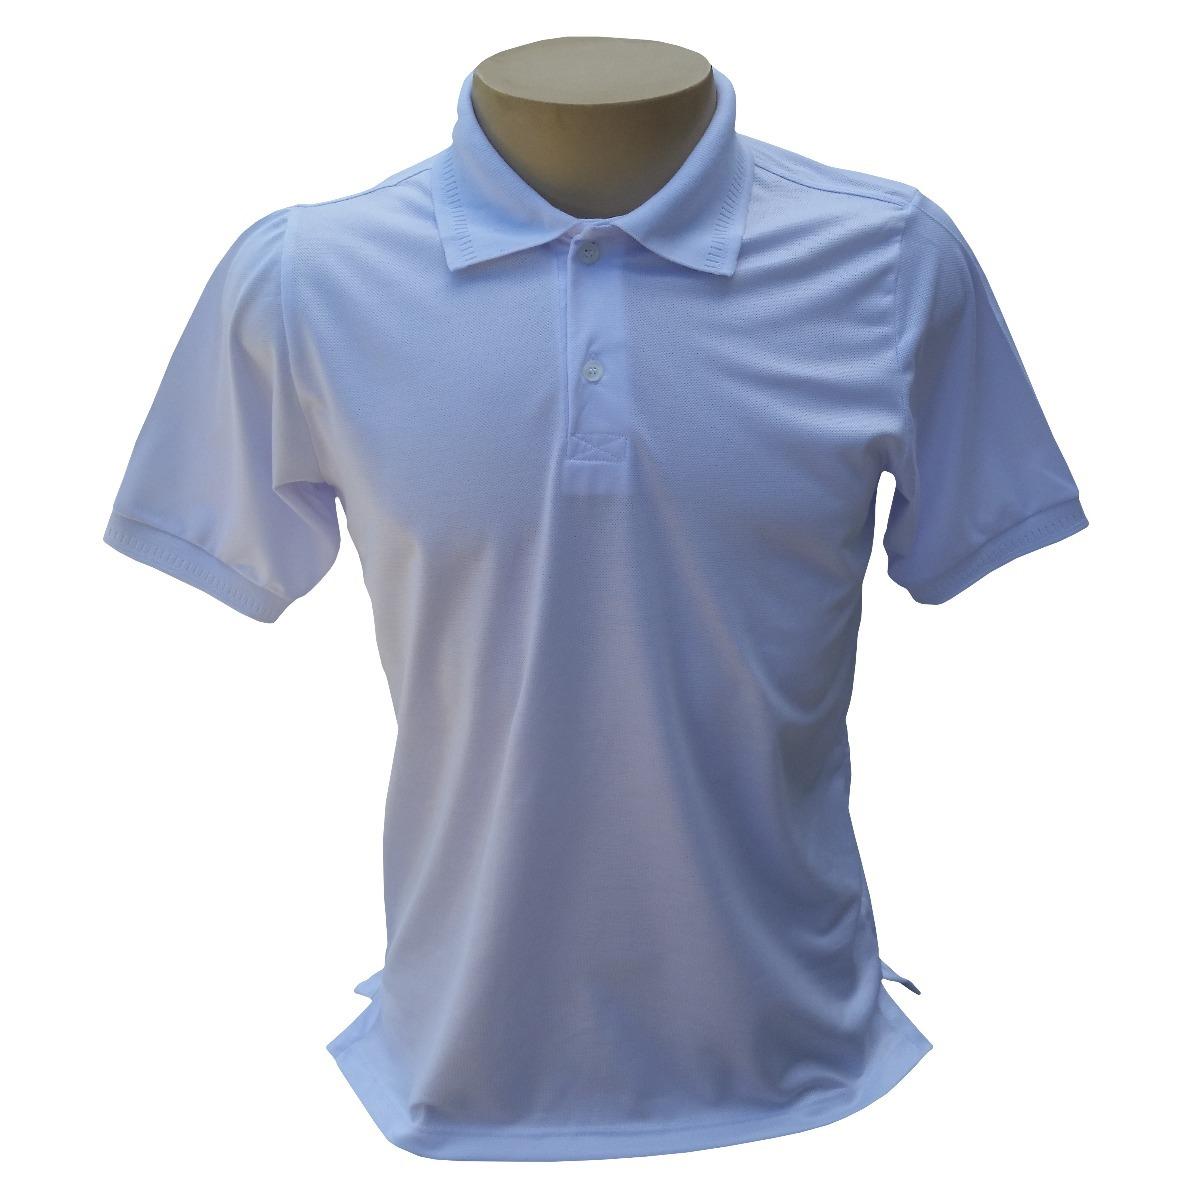 c62fb01994 50 camisas polo piquet 100% poliéster para estampar. Carregando zoom.